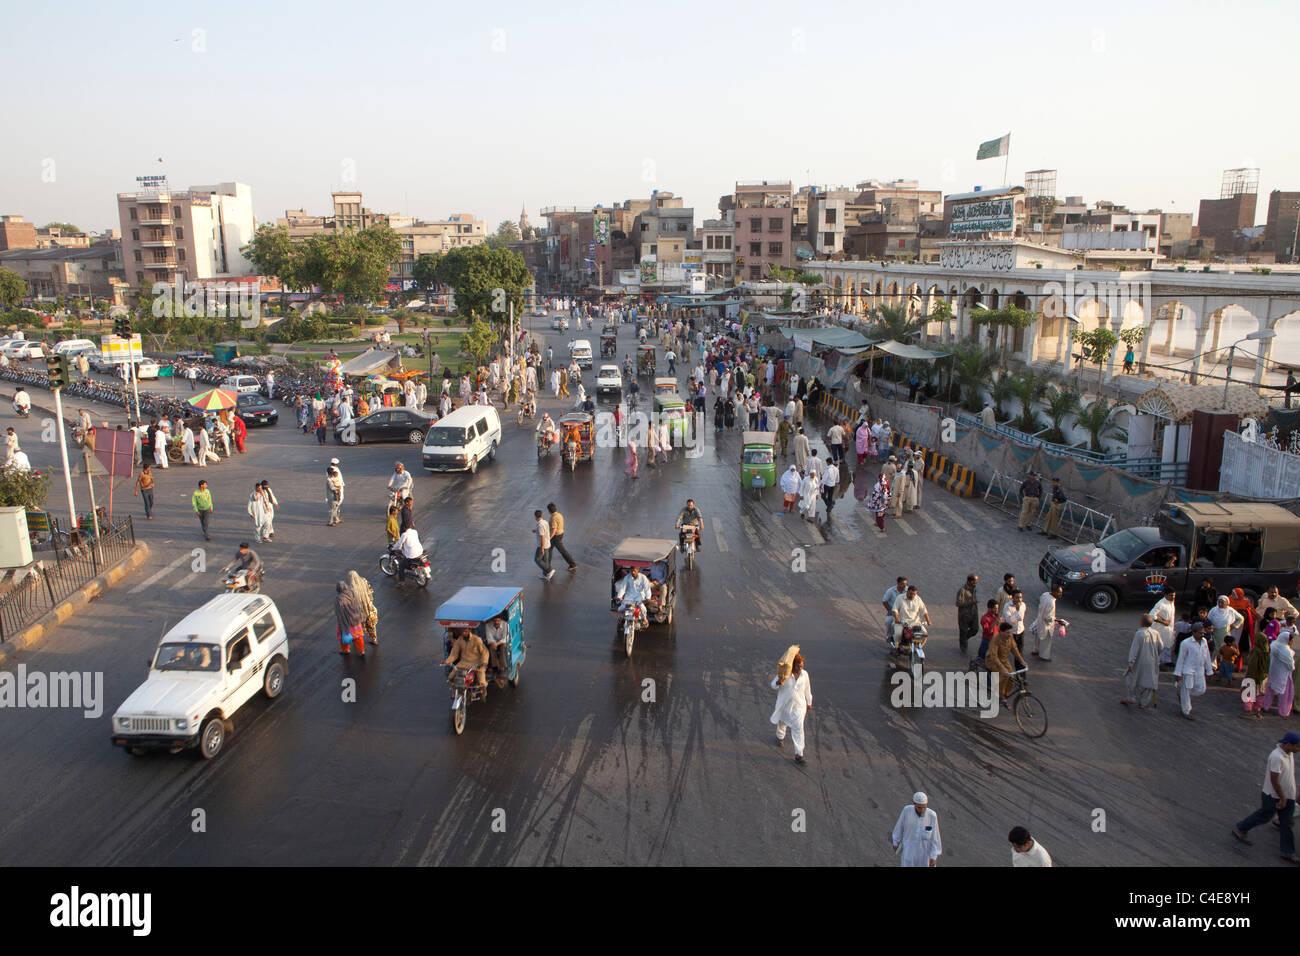 traffic in lahore, Pakistan Stock Photo: 37193733 - Alamy